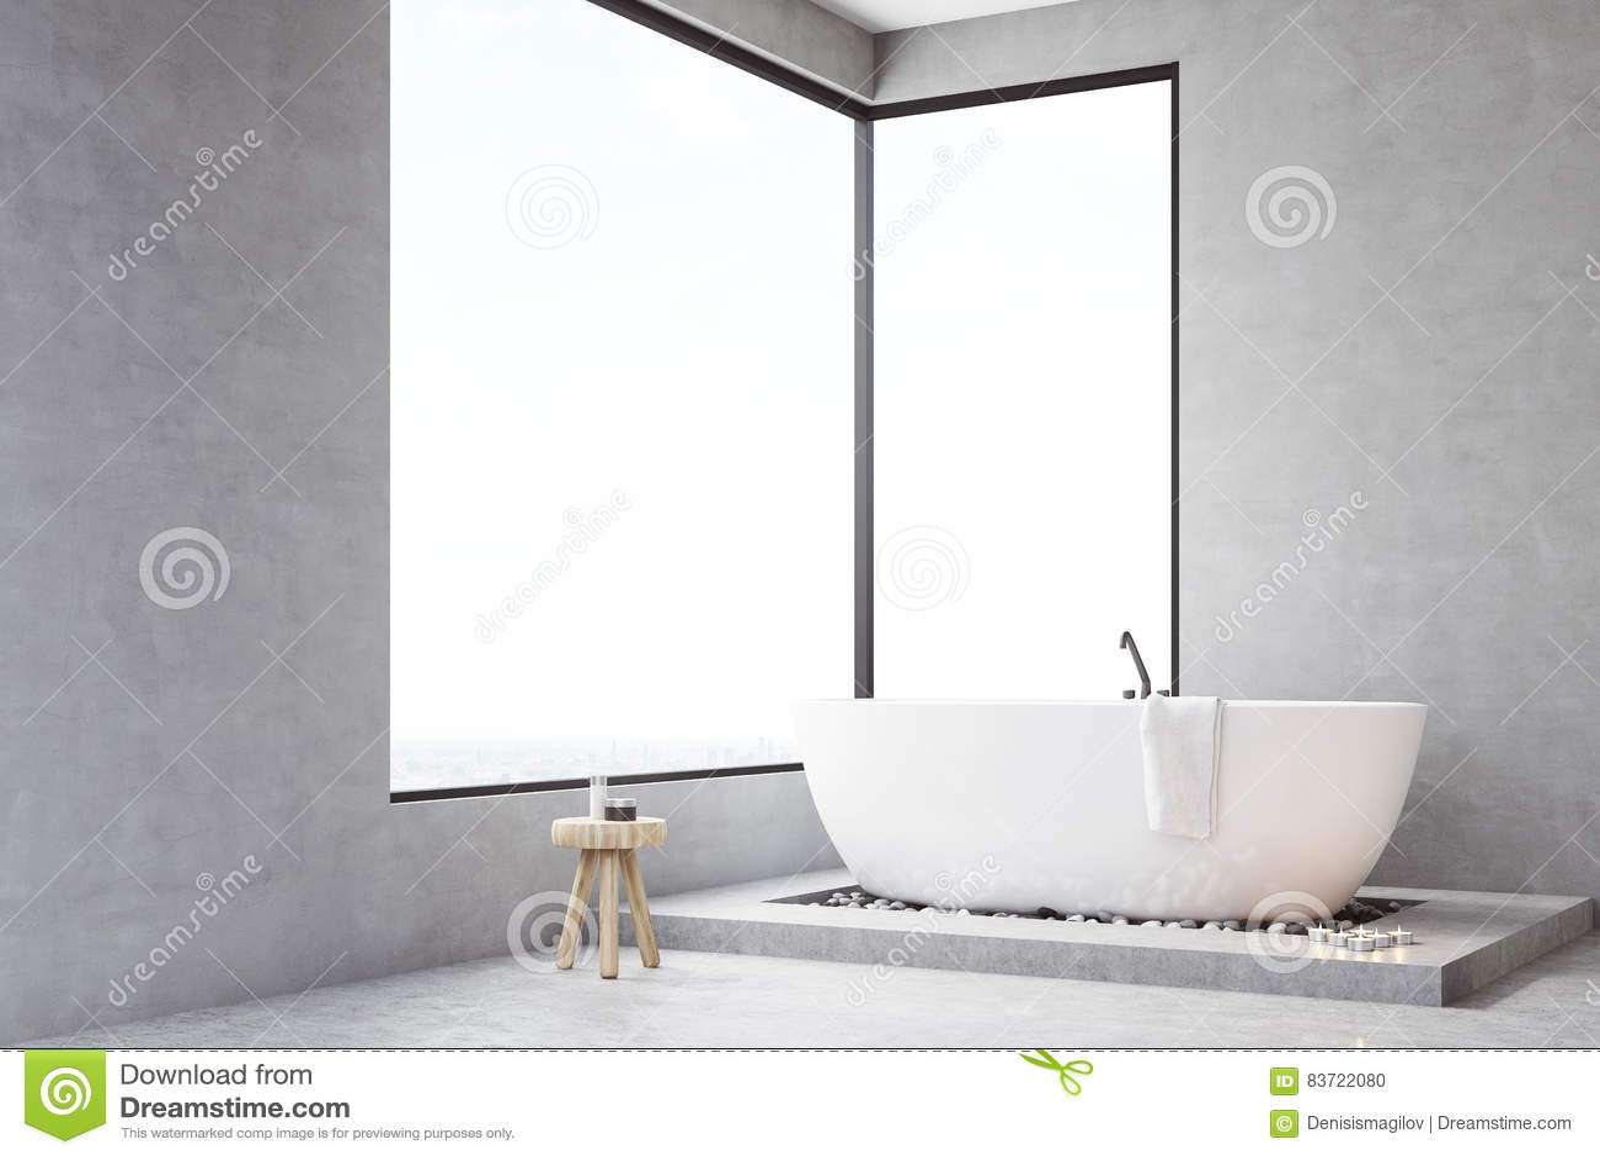 Corner Of Bathroom With Rectangular Window Stock Illustration